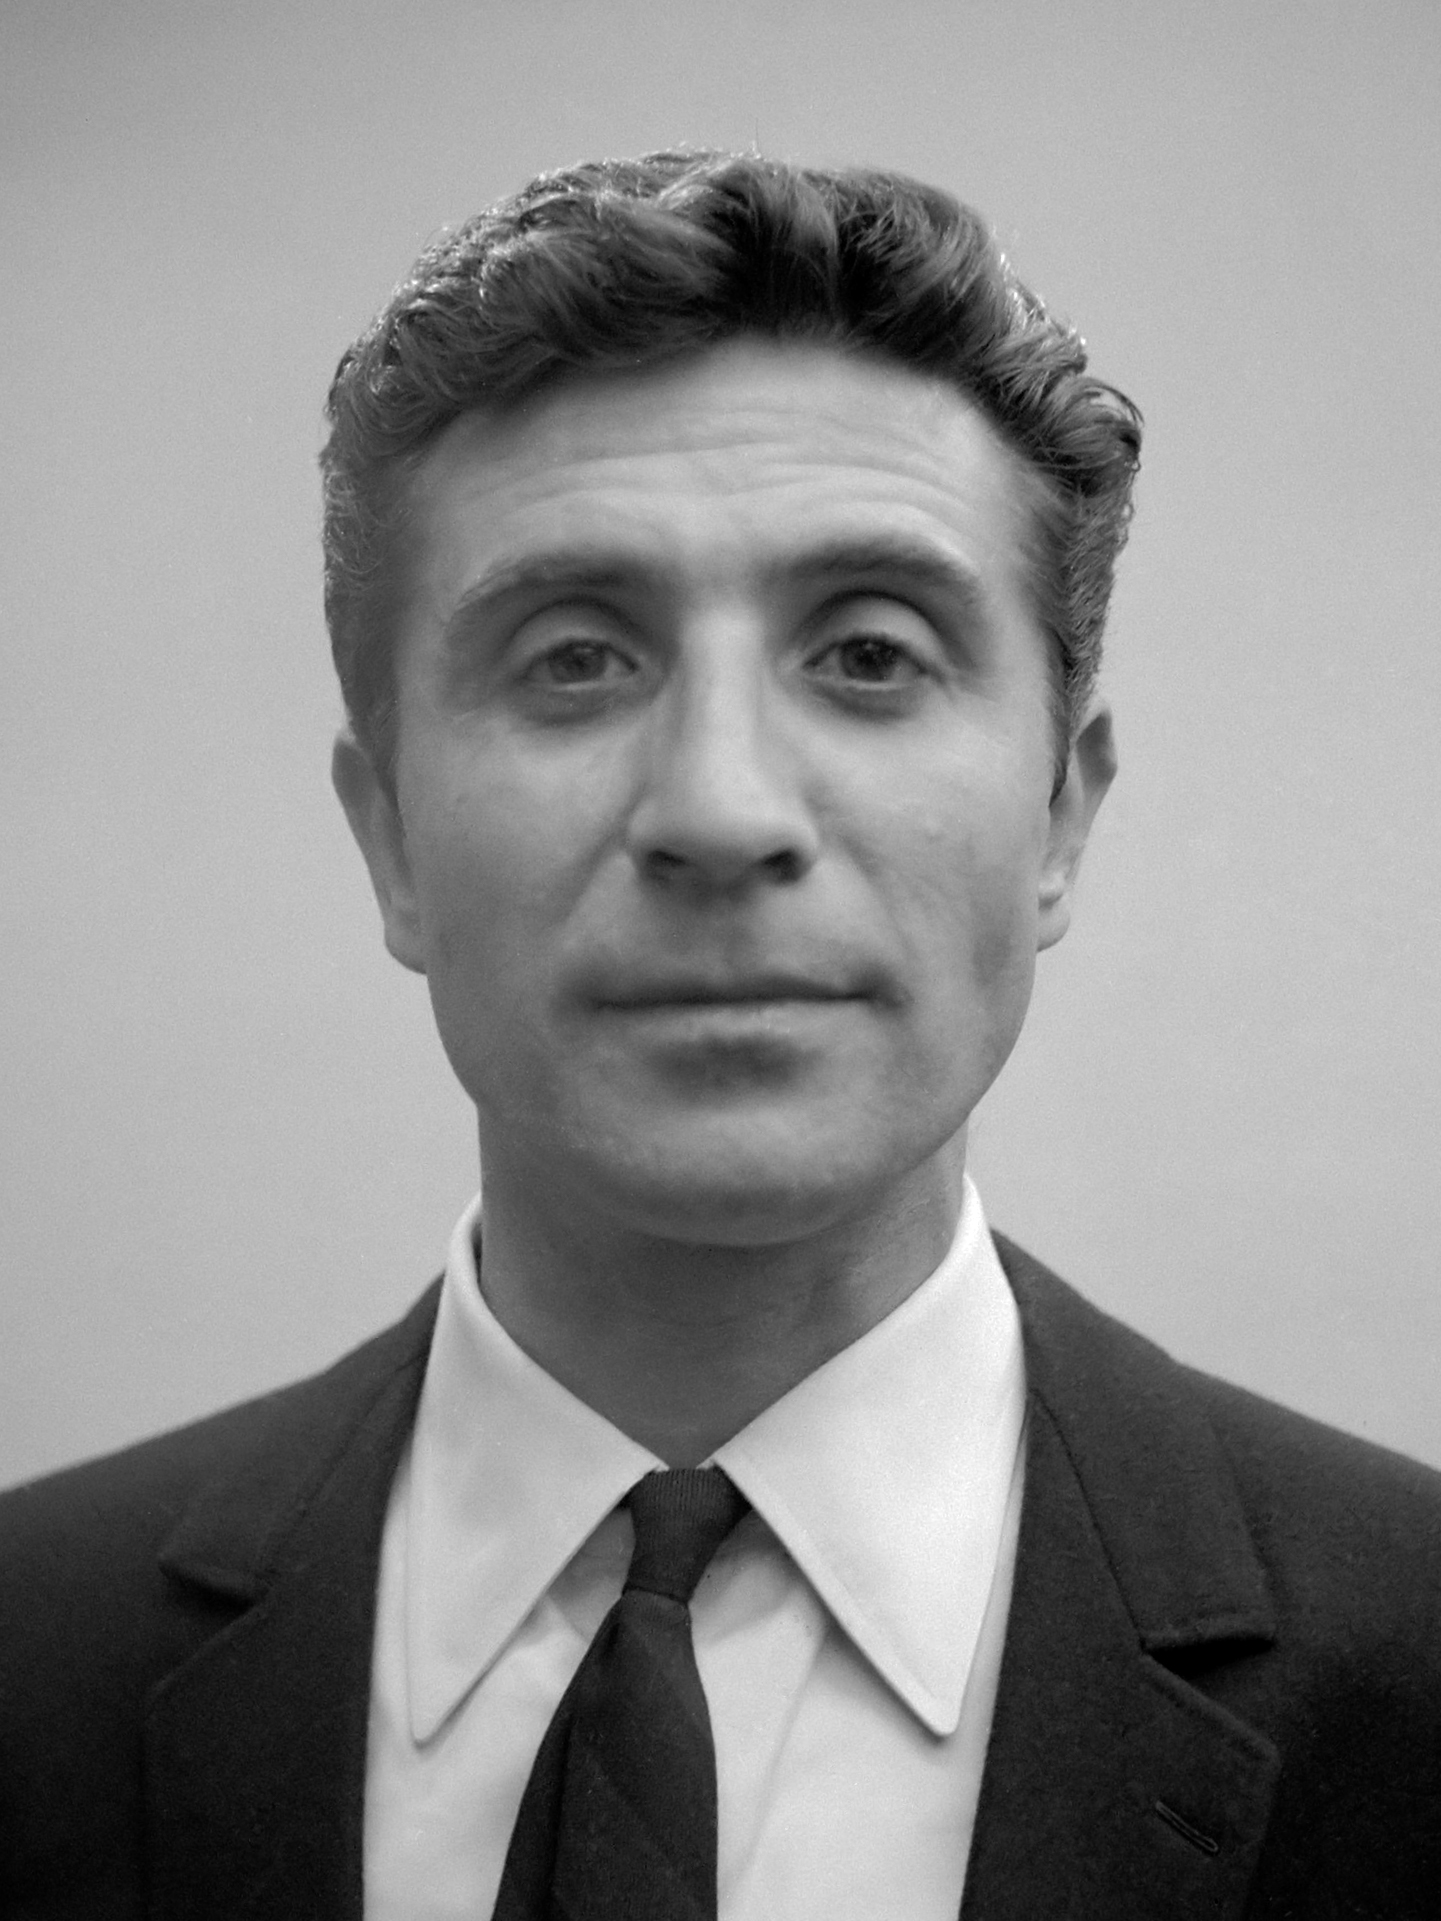 Gilbert_Bécaud_(1964).jpg